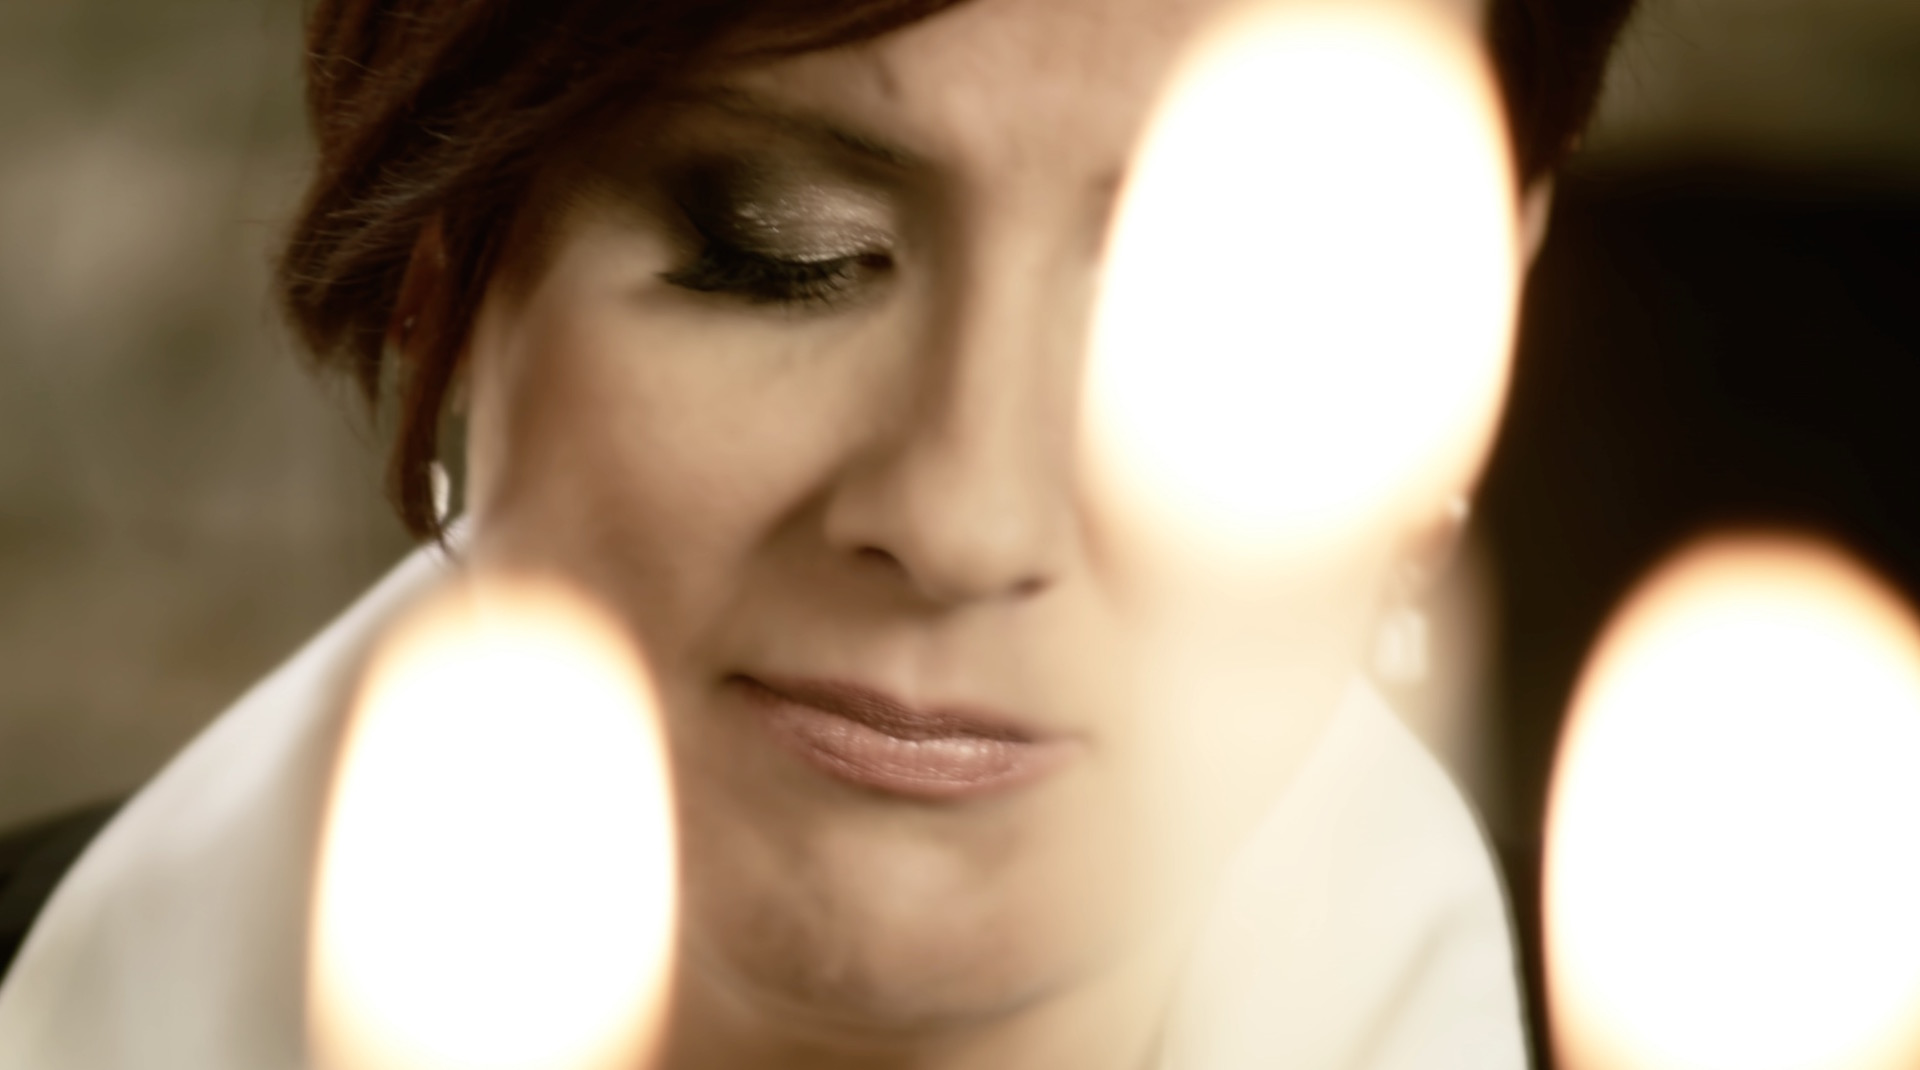 Karin-music-video-Screenshot 2015-11-08 08.06.20.jpg